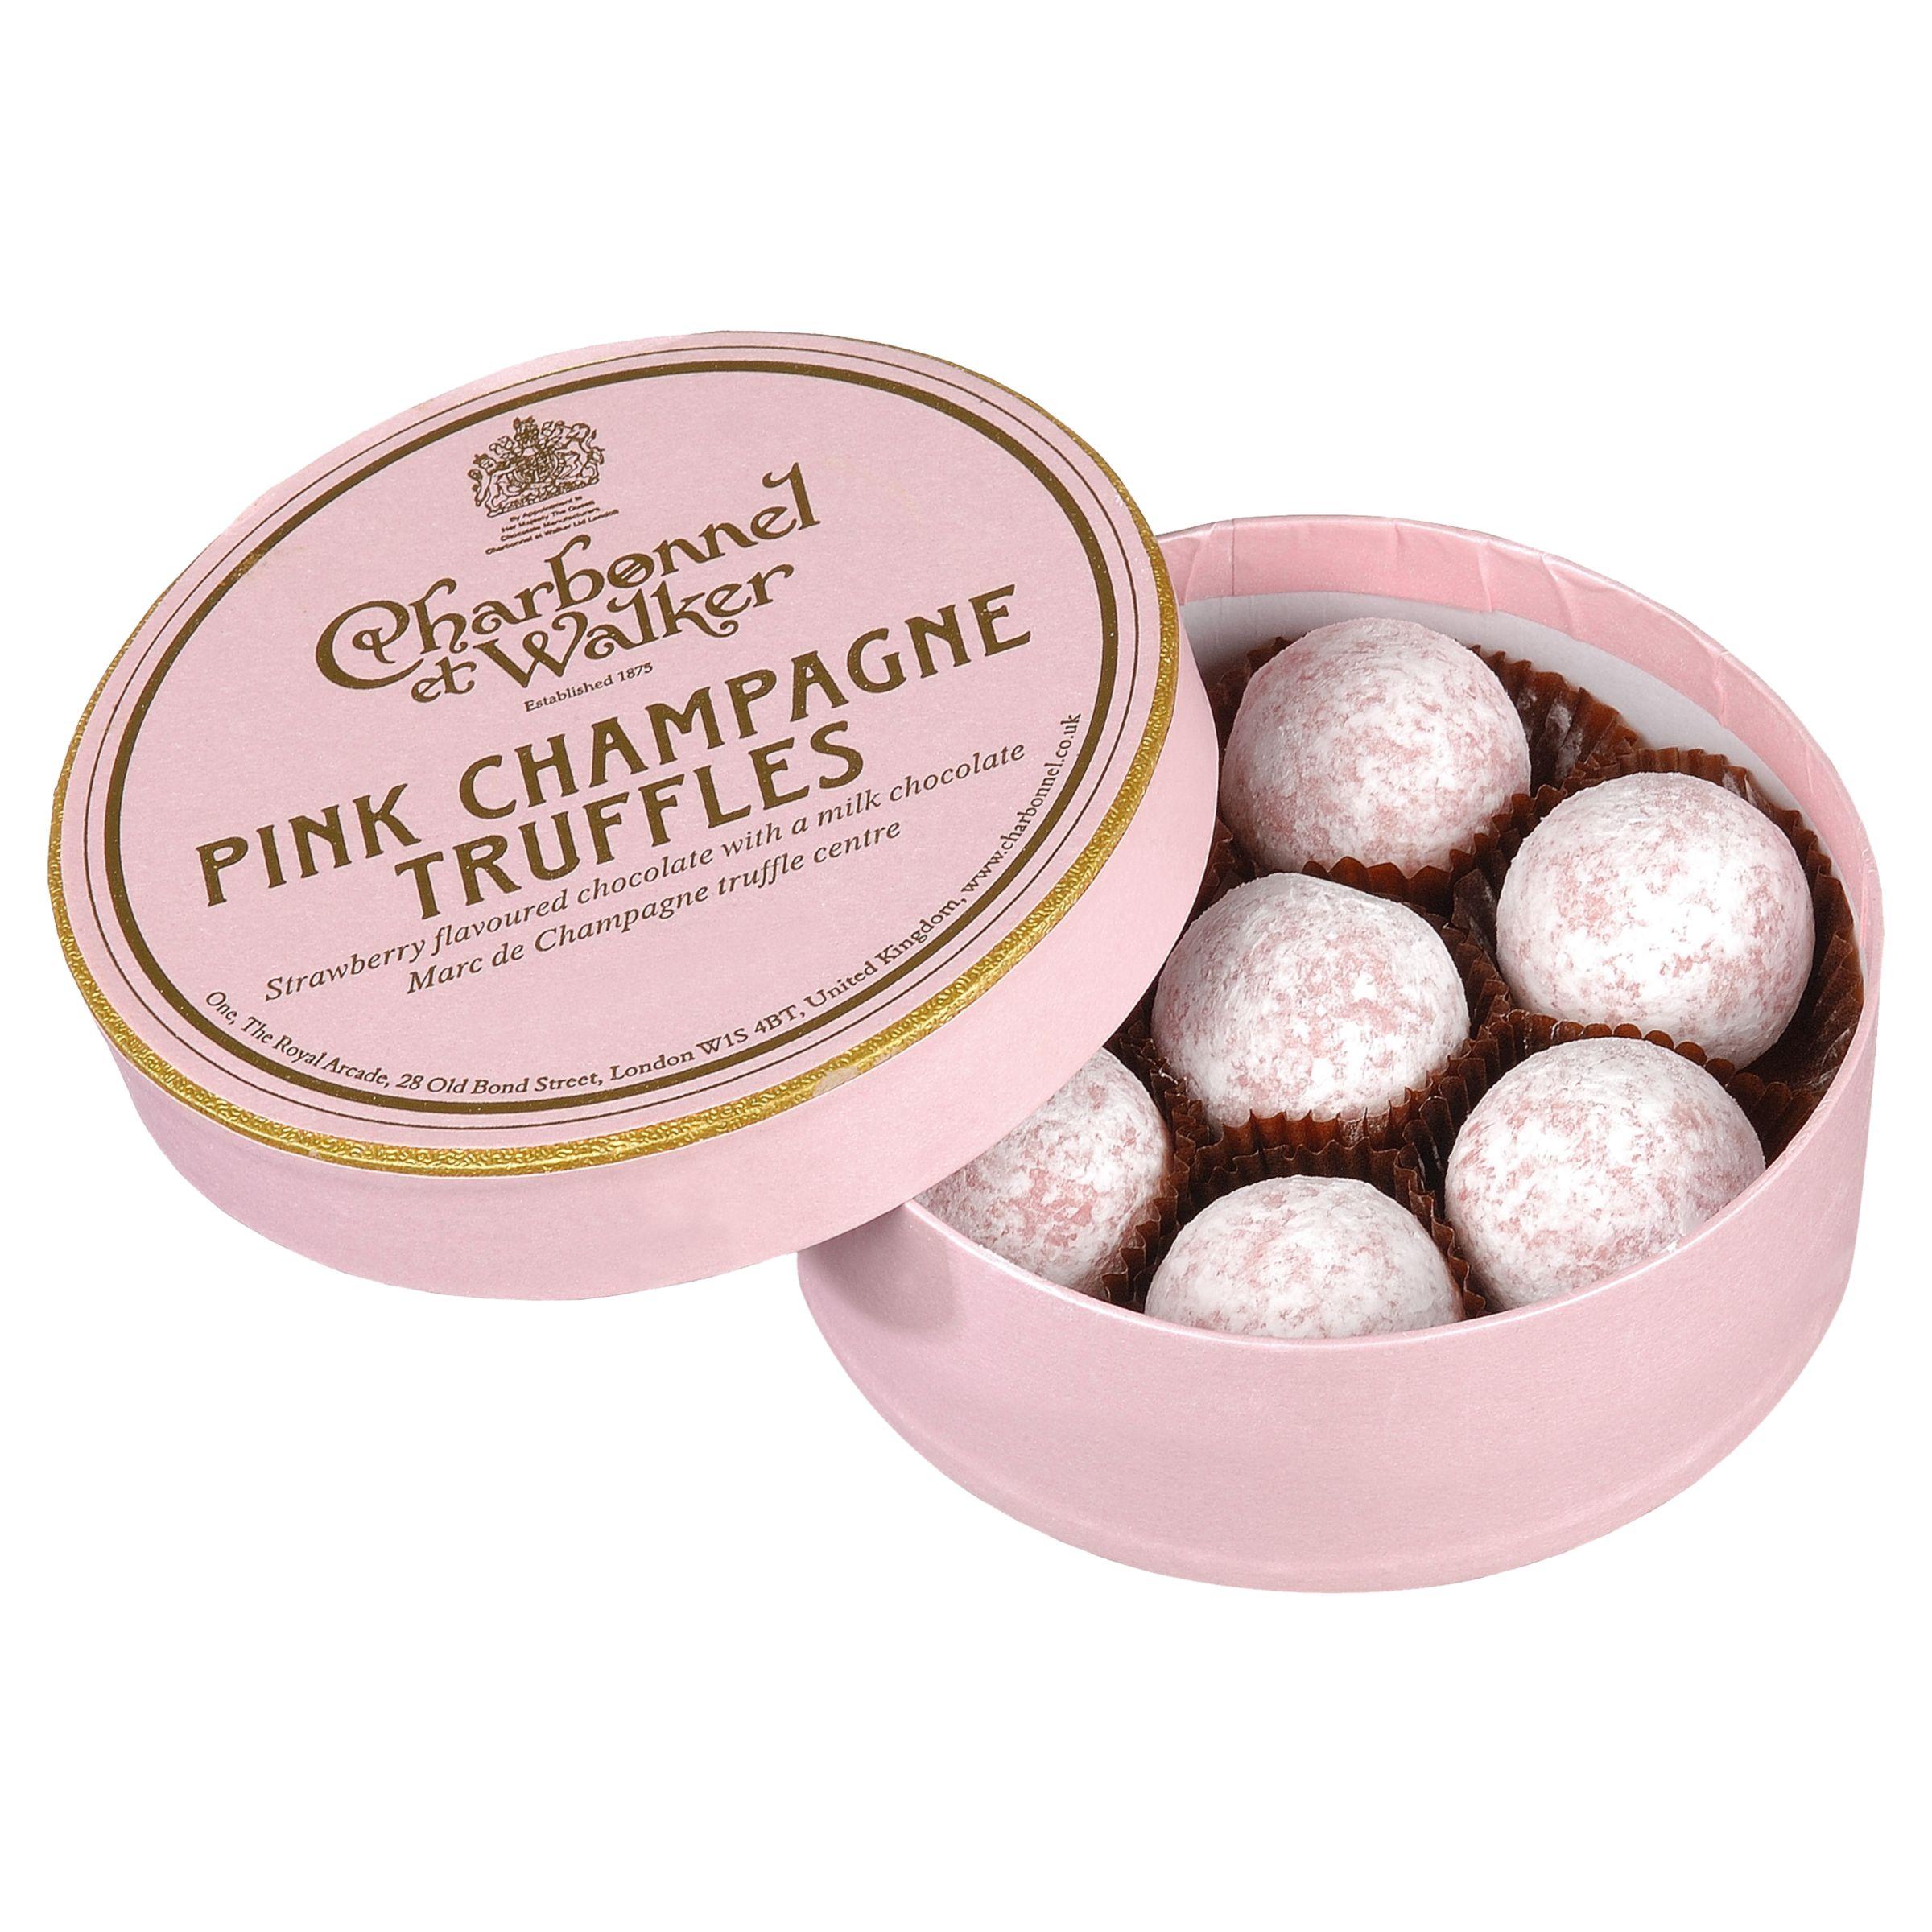 Charbonnel et Walker Charbonnel et Walker Pink Champagne Truffles, 135g